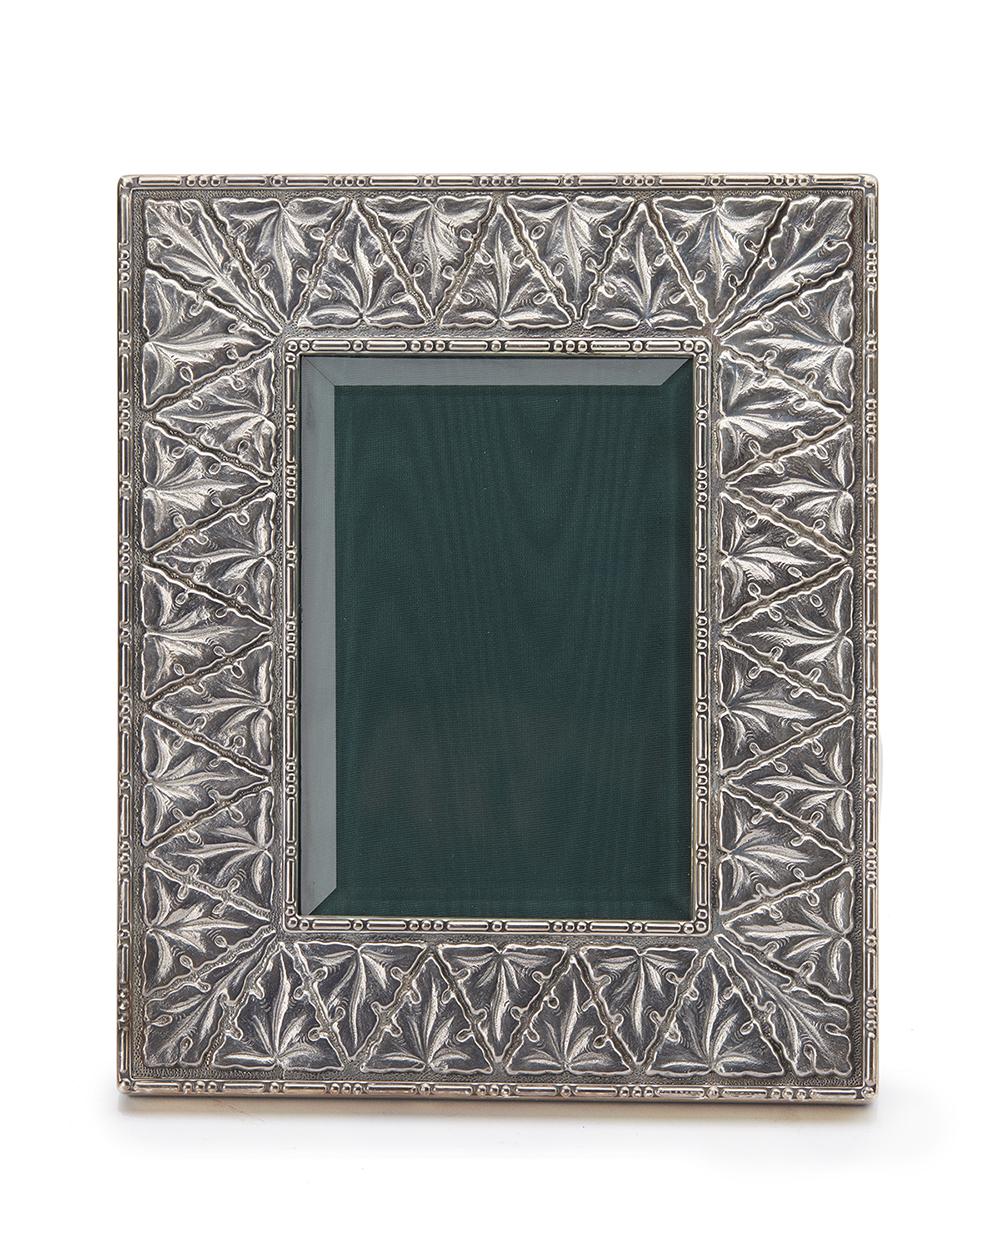 Lot 1231 - A Buccallati sterling silver picture frame